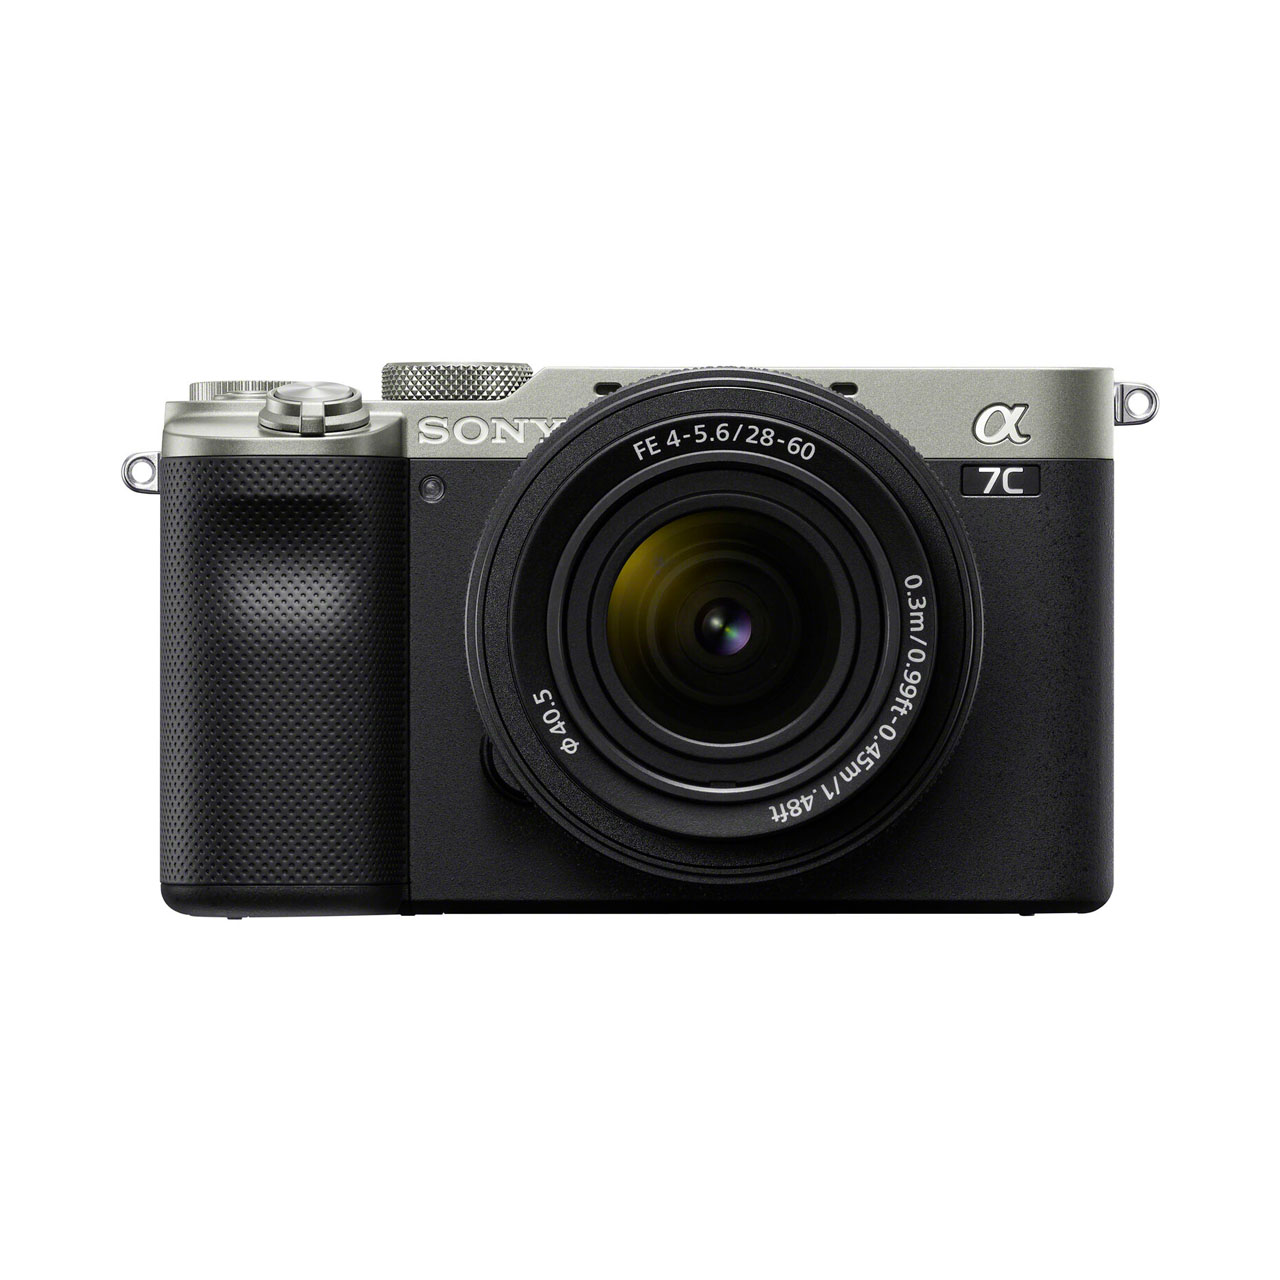 Sony Cámara Evil Alpha 7C ILCE-7CLS Plata Objetivo 28-60mm + Bolsa LCSX10